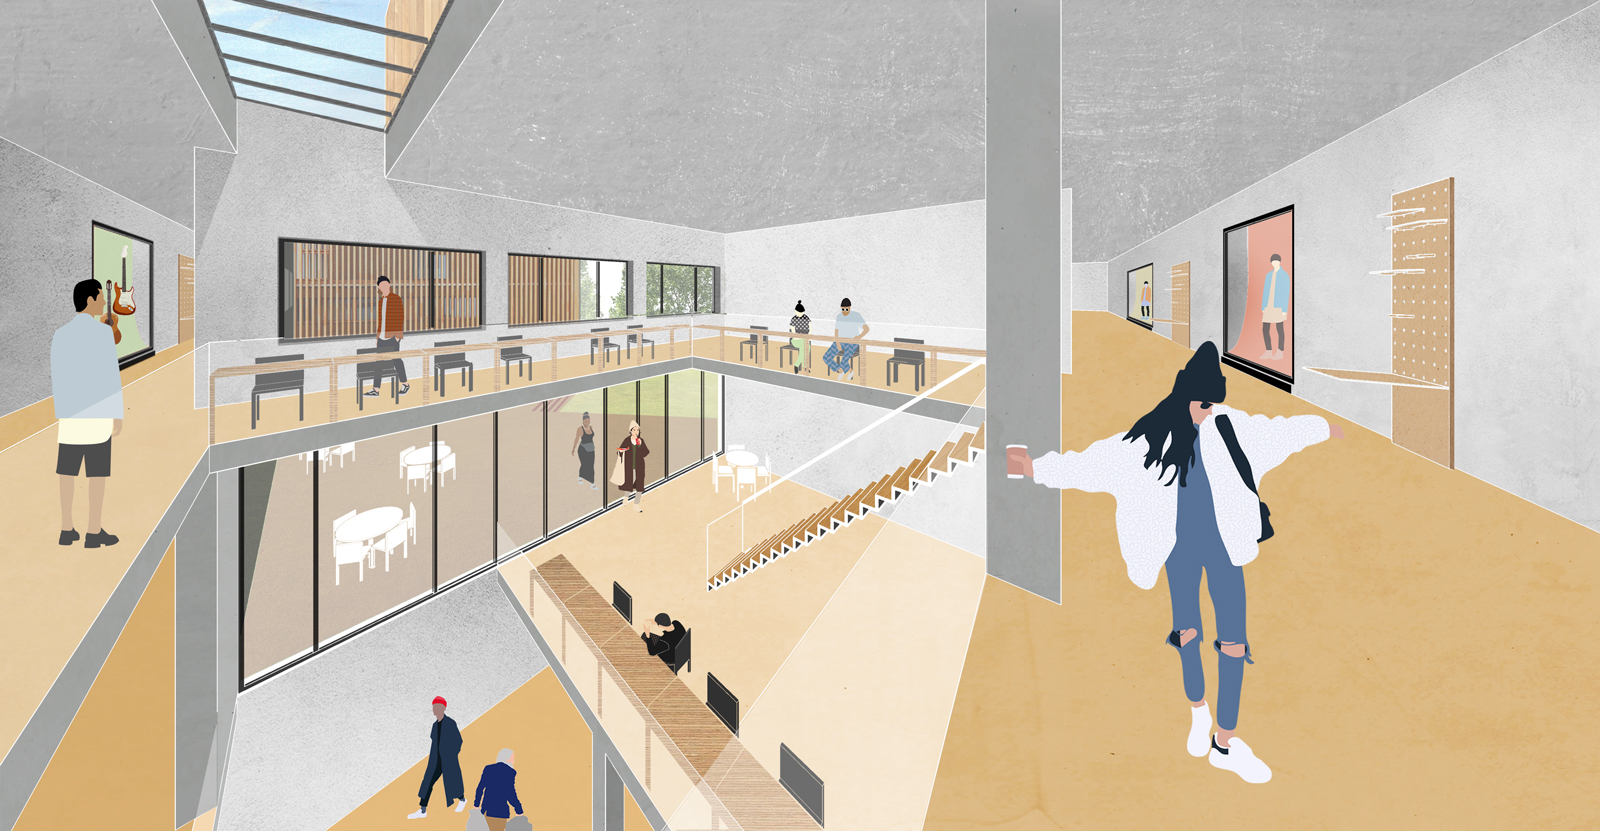 interieur_school_nimeto_utrecht_architectuur_maken